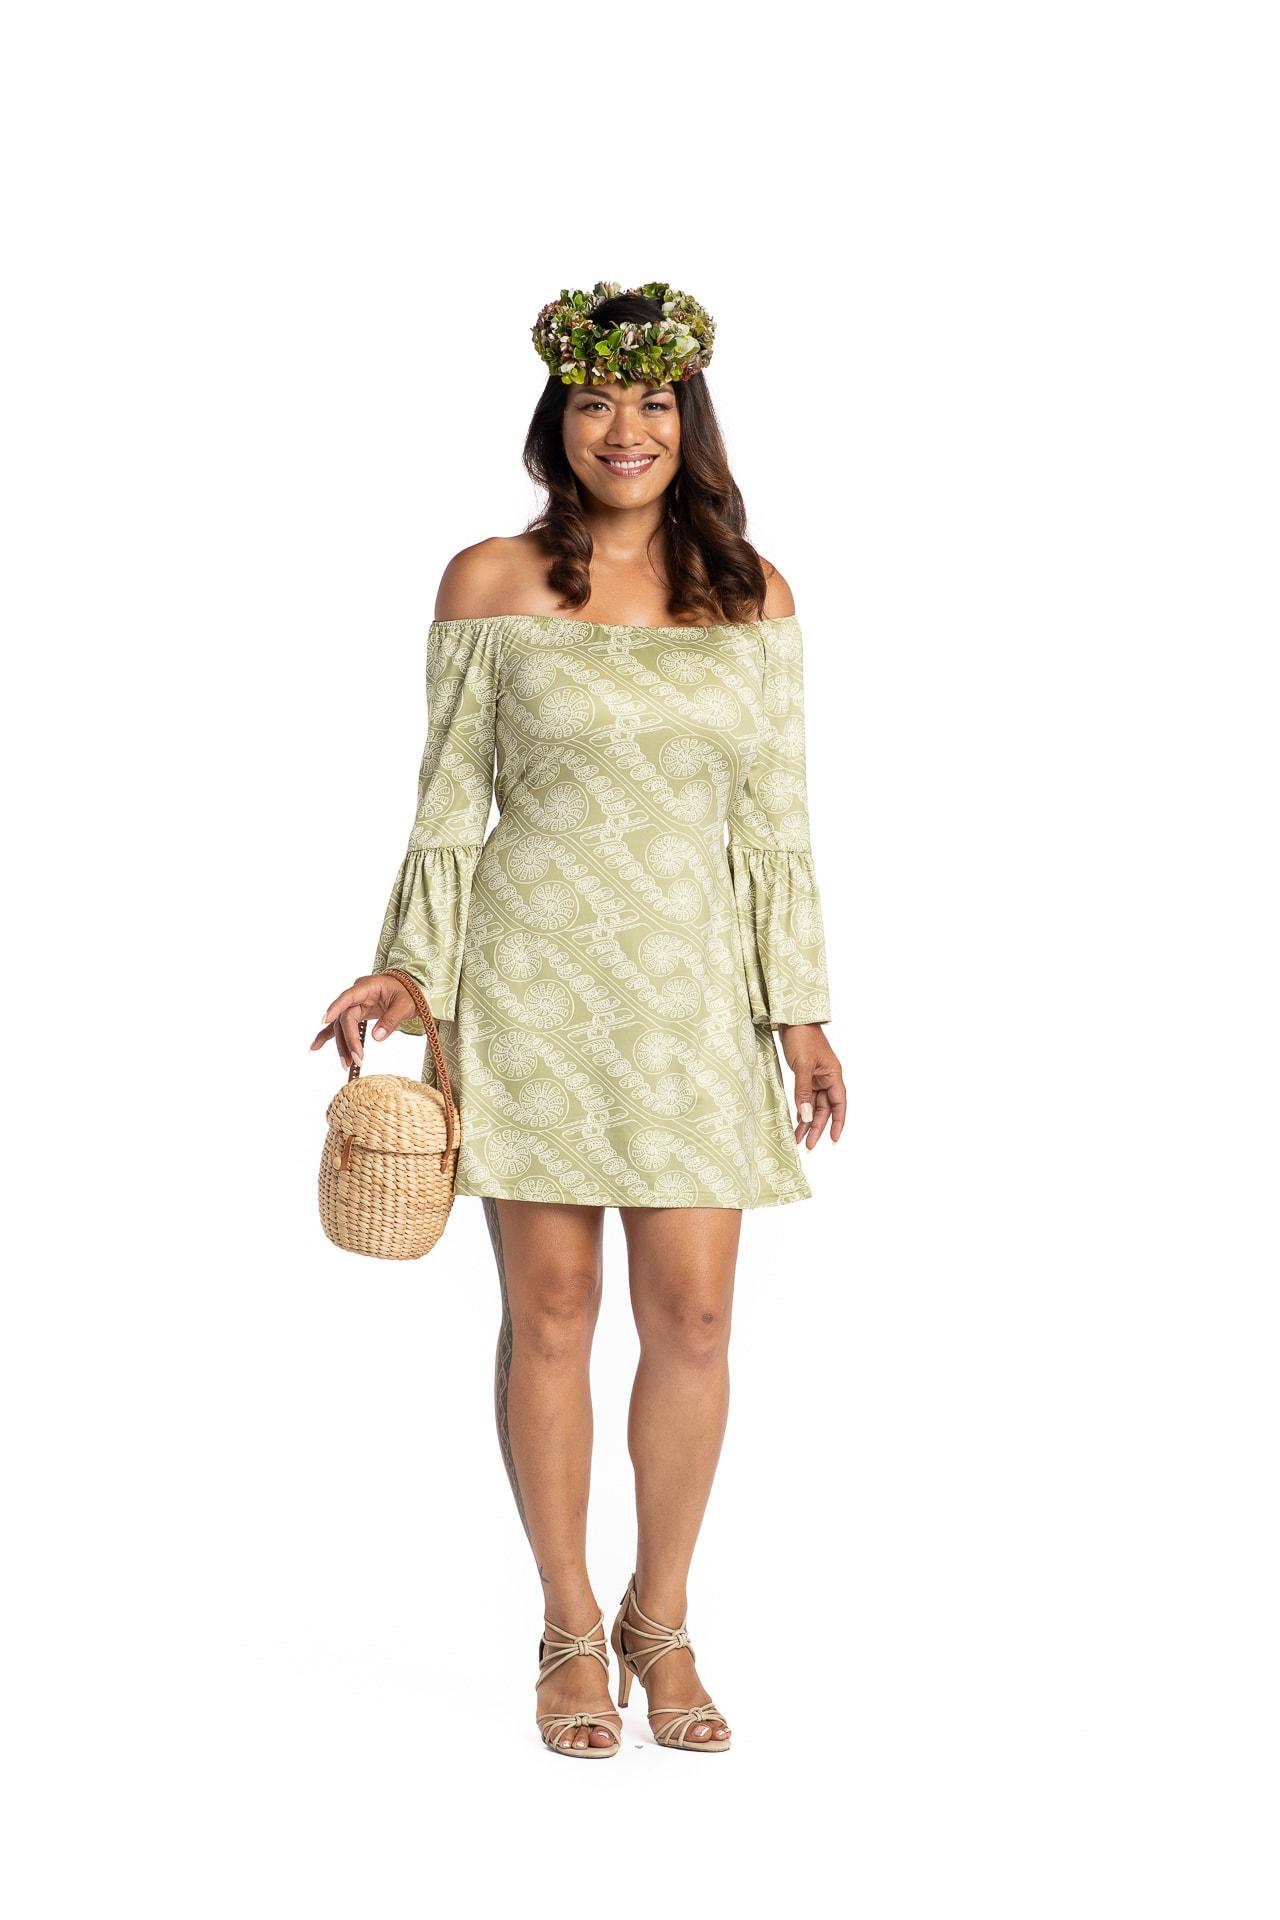 Model wearing Mele Short Dress in Amau Green - Front View